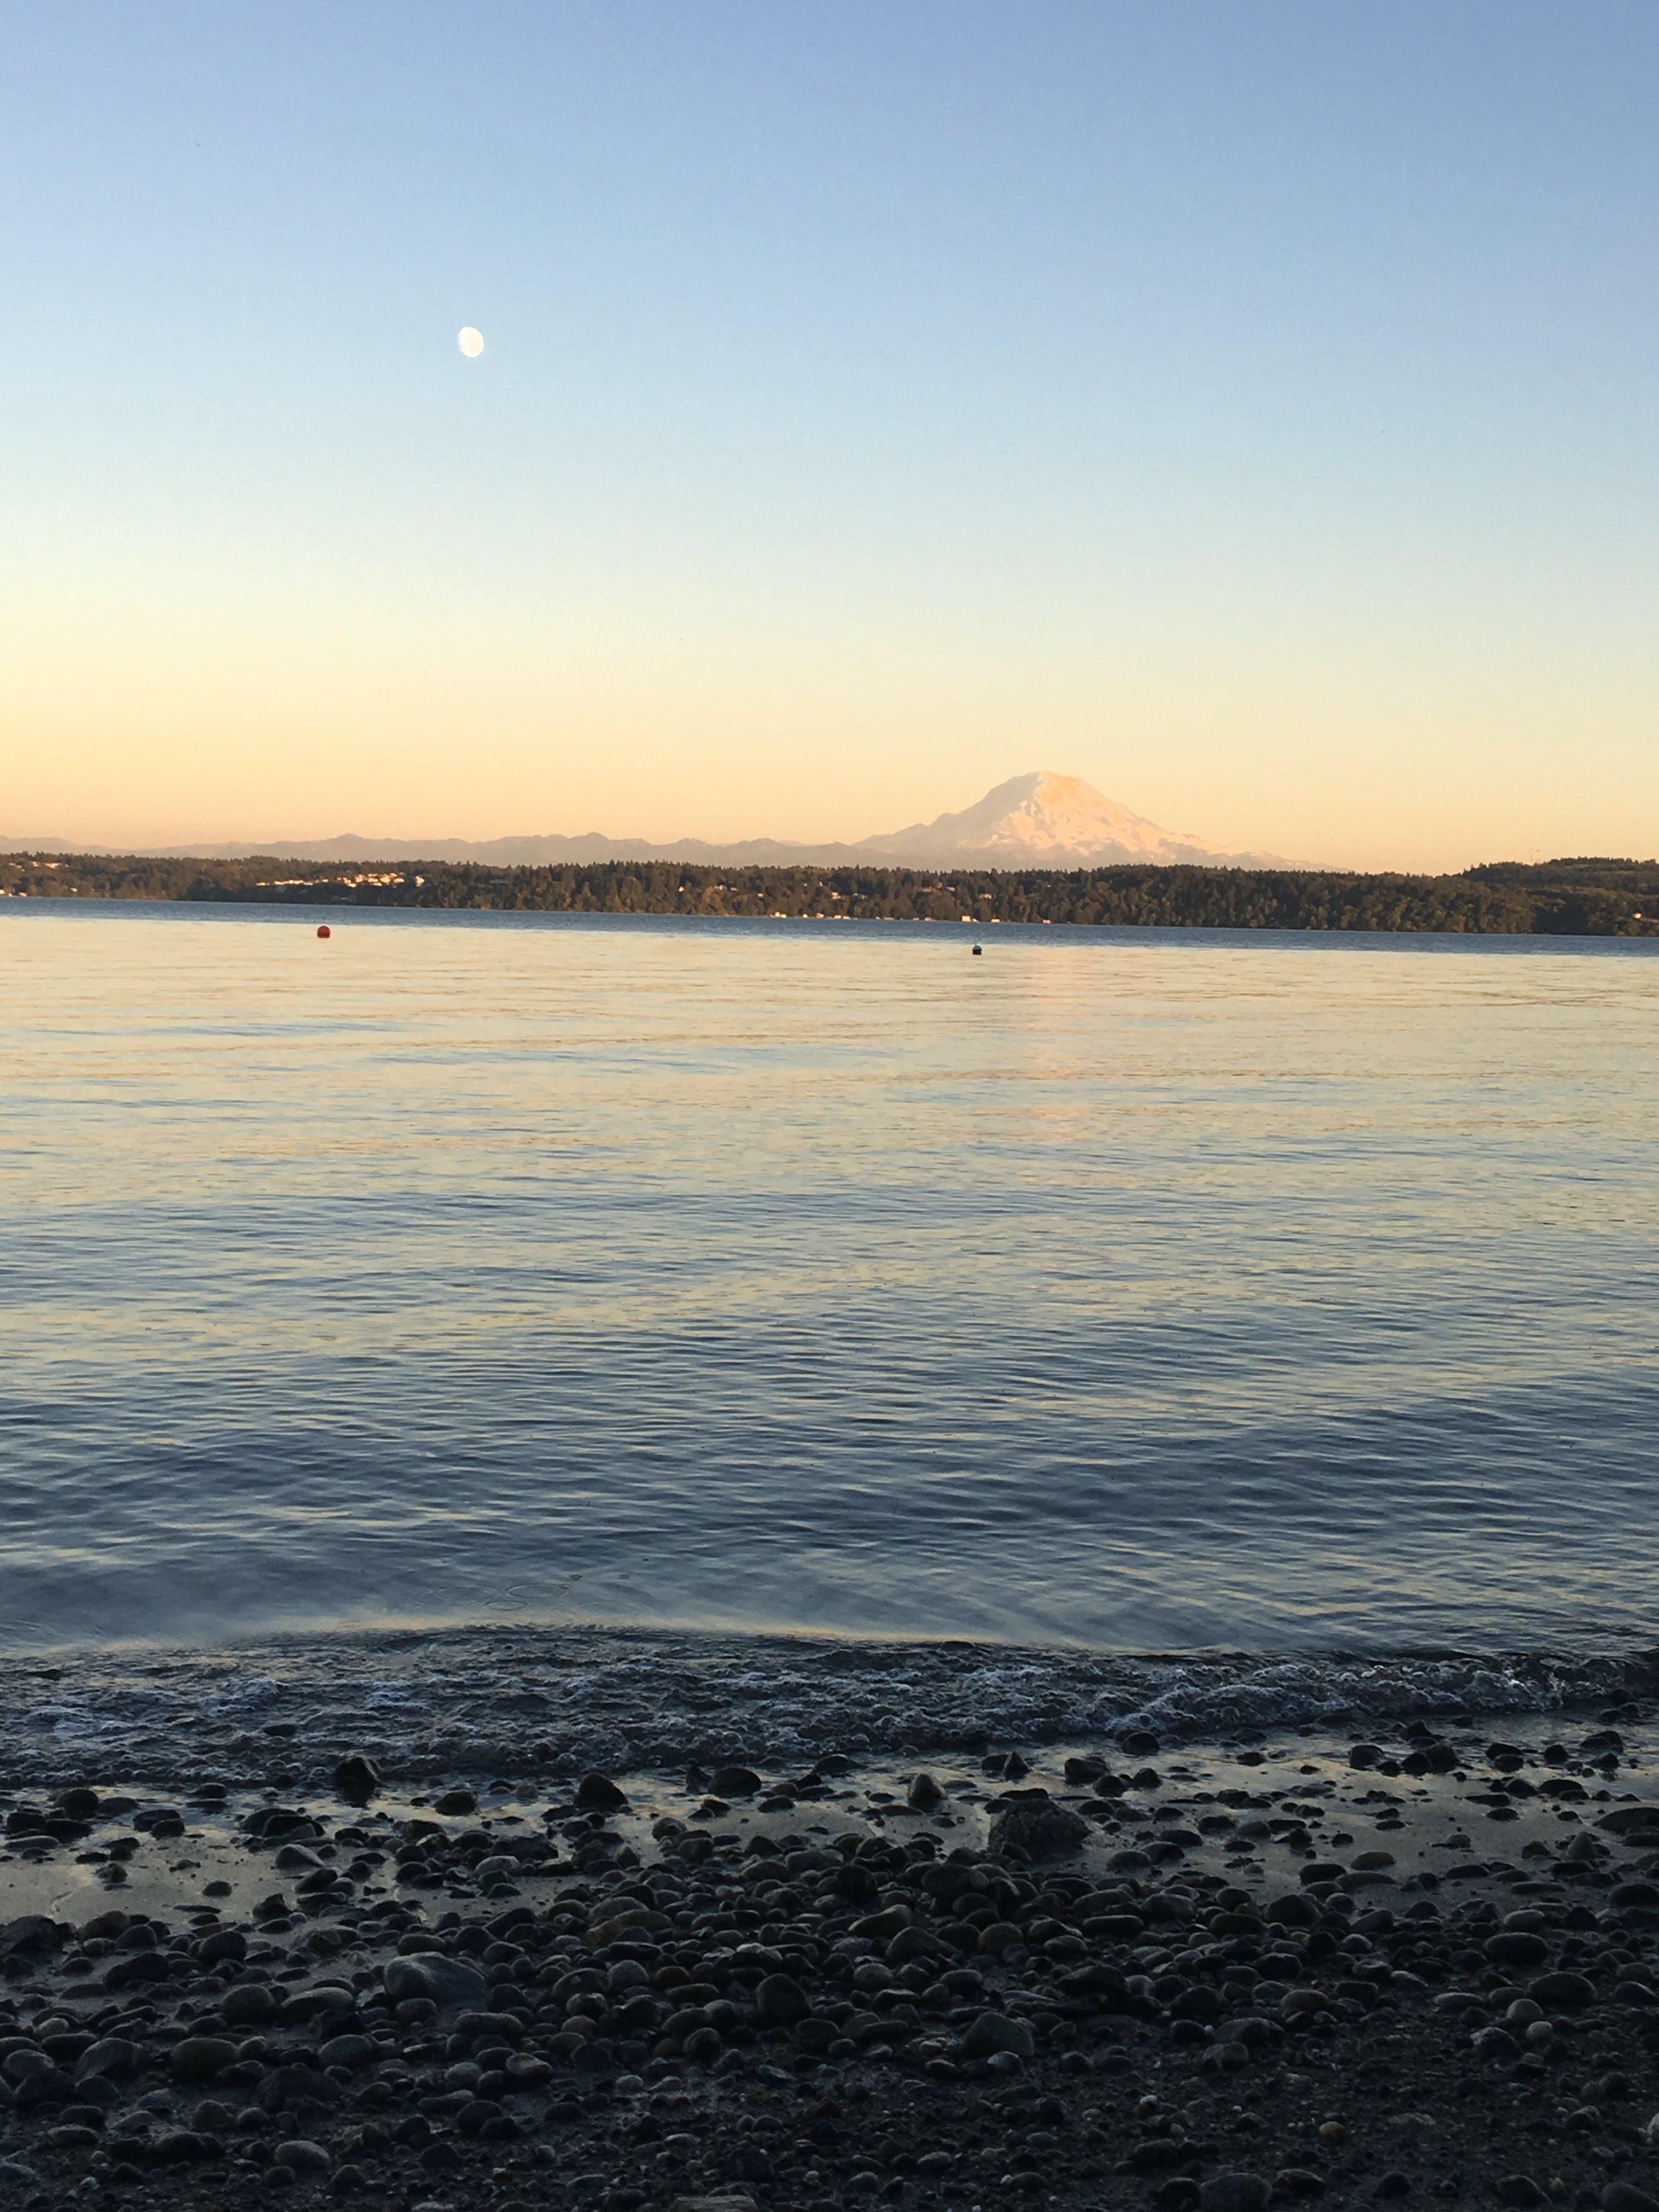 Free stock photo of beach, blue sky, landscape, Mount Rainer